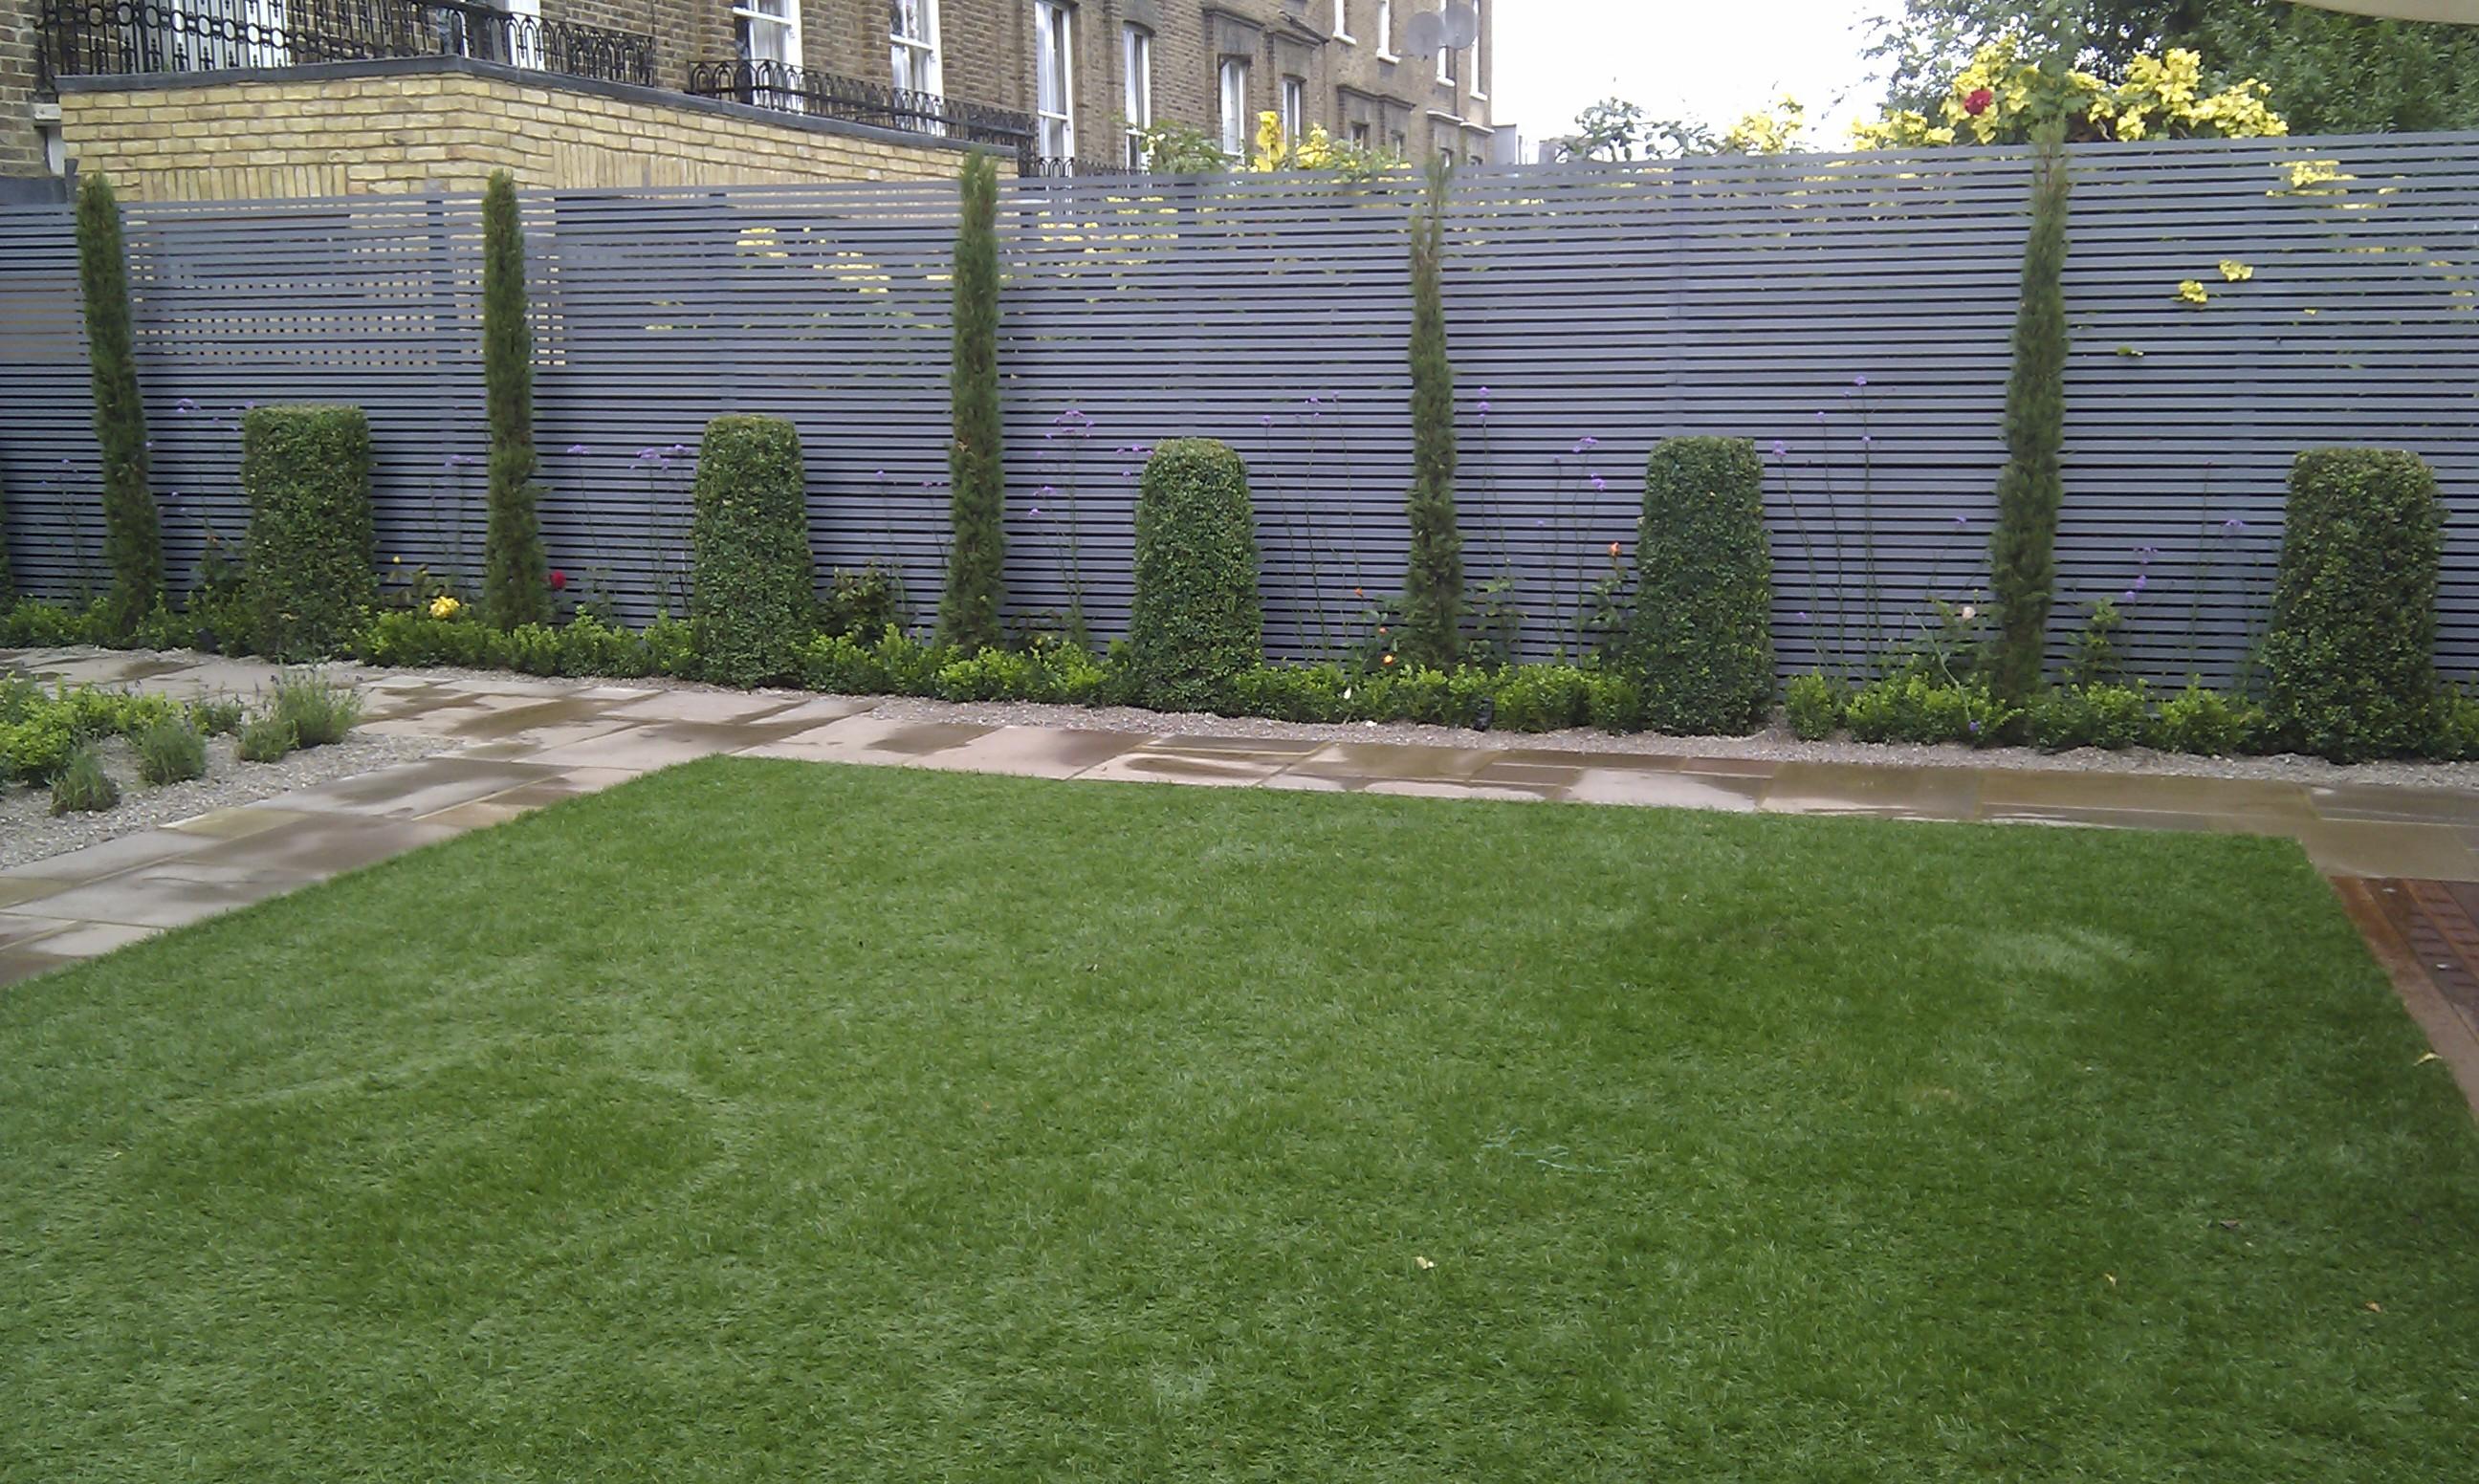 modern garden design london slatted grey privacy screen sandstone paving easy grass balau hardwood decking (14)